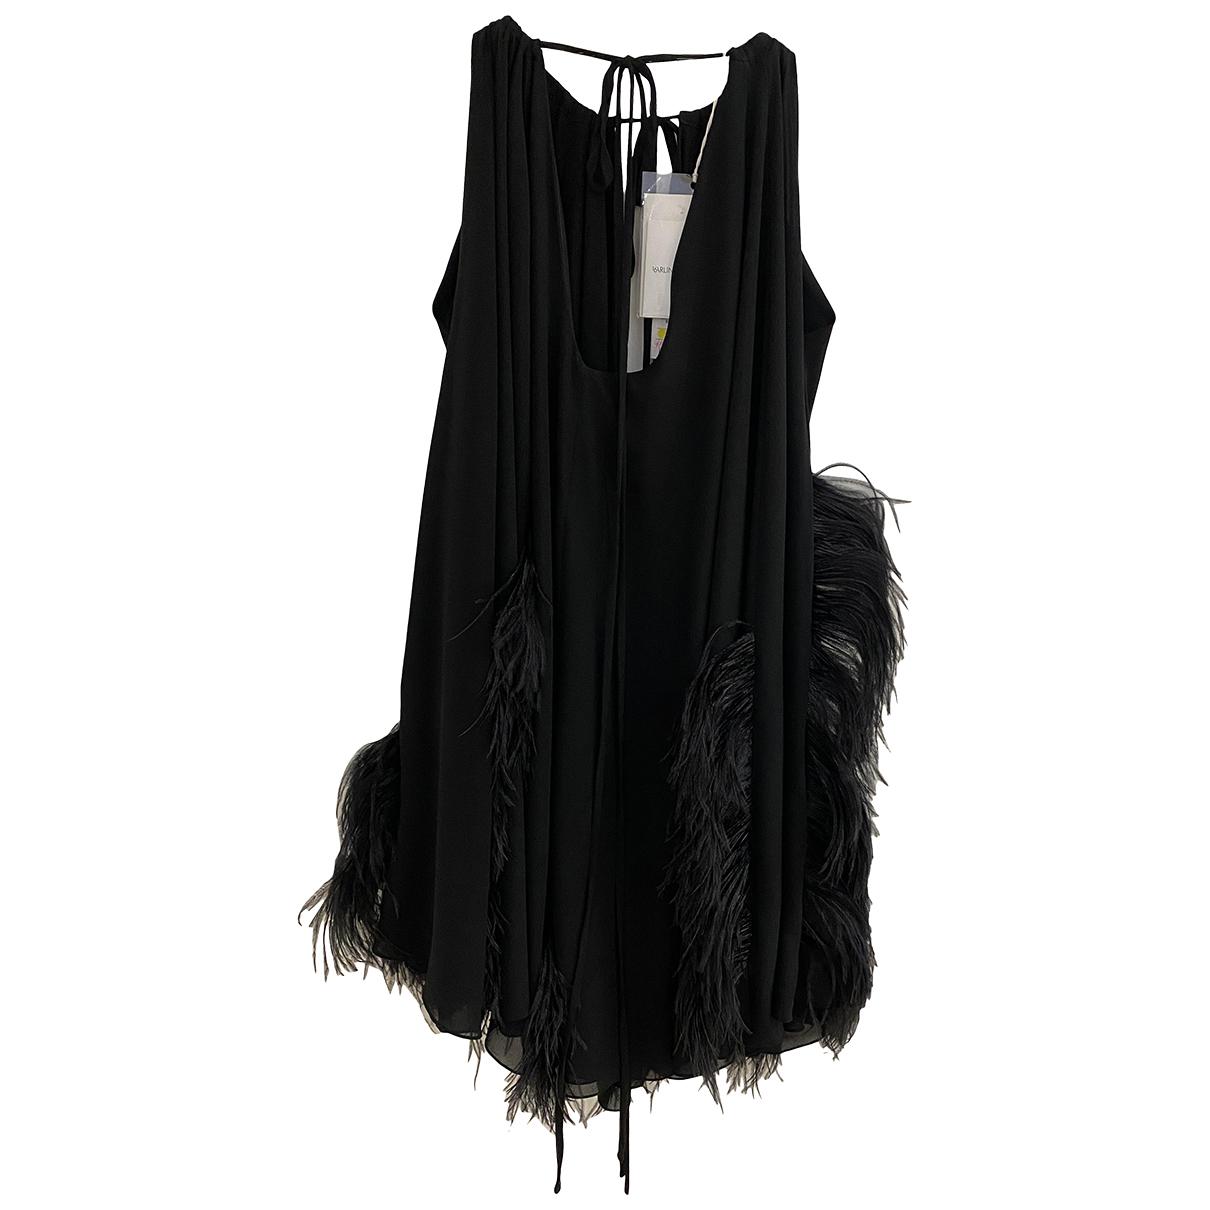 16 Arlington \N Kleid in  Schwarz Polyester